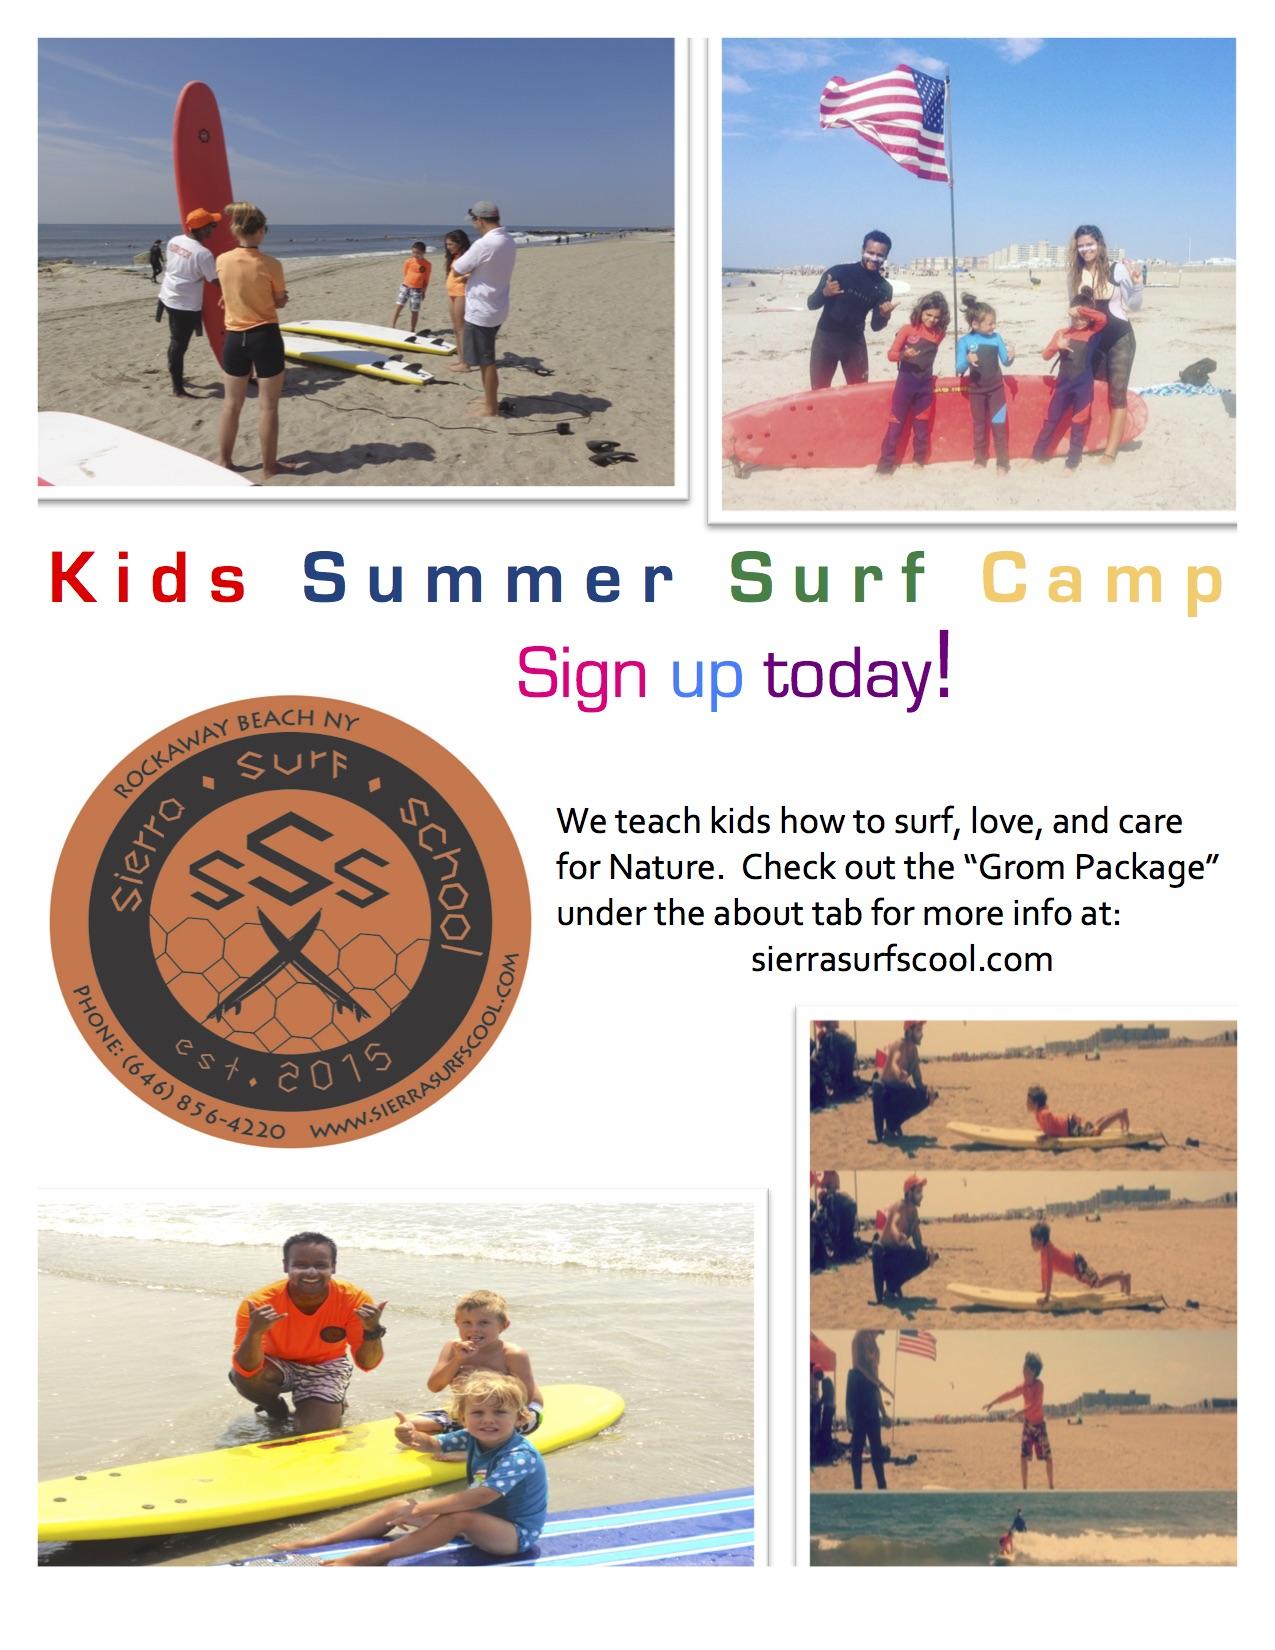 Sierra Surf School kids camp surfing lessons